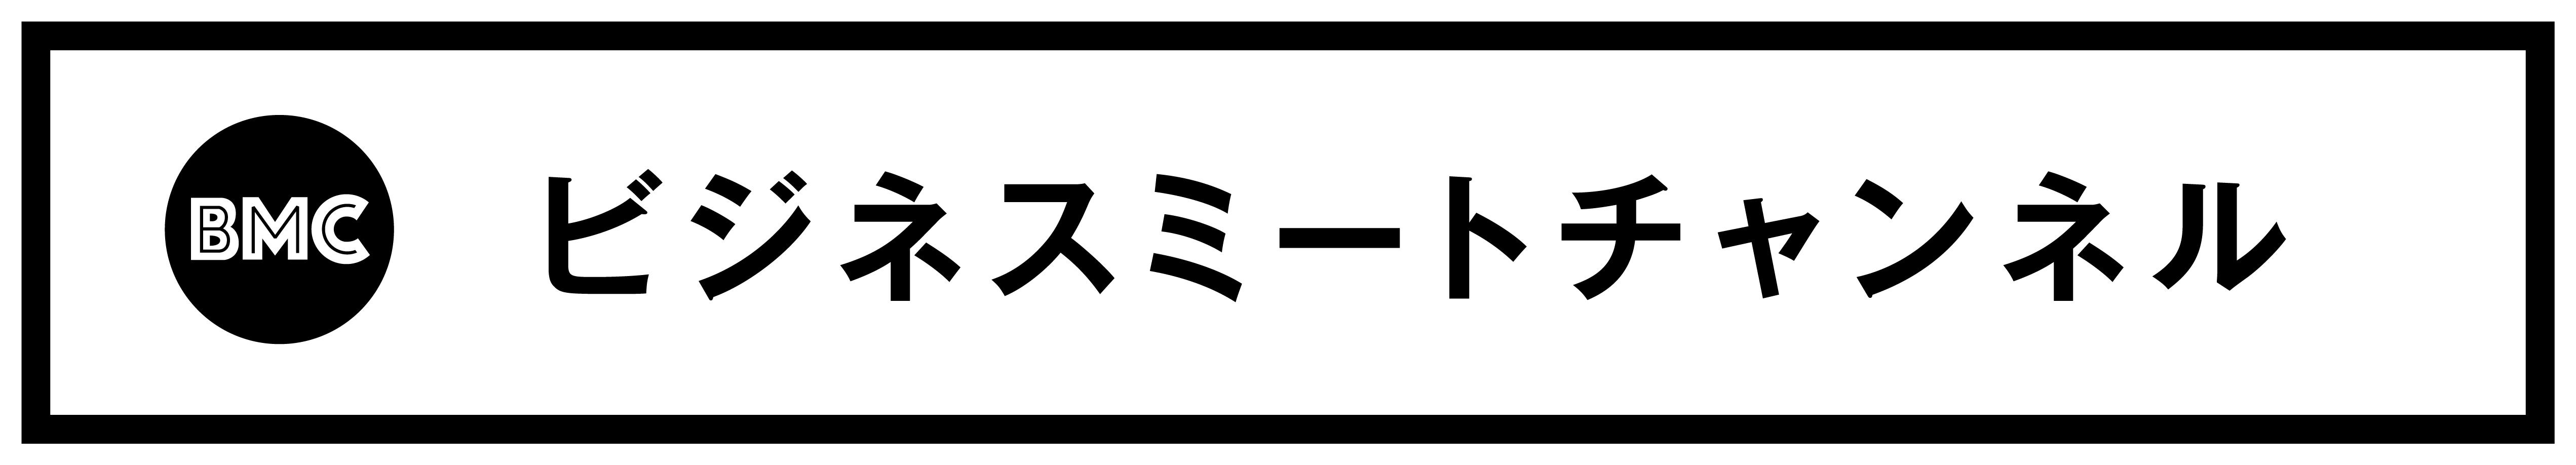 _blog_ハ?ナー 2-11.jpg